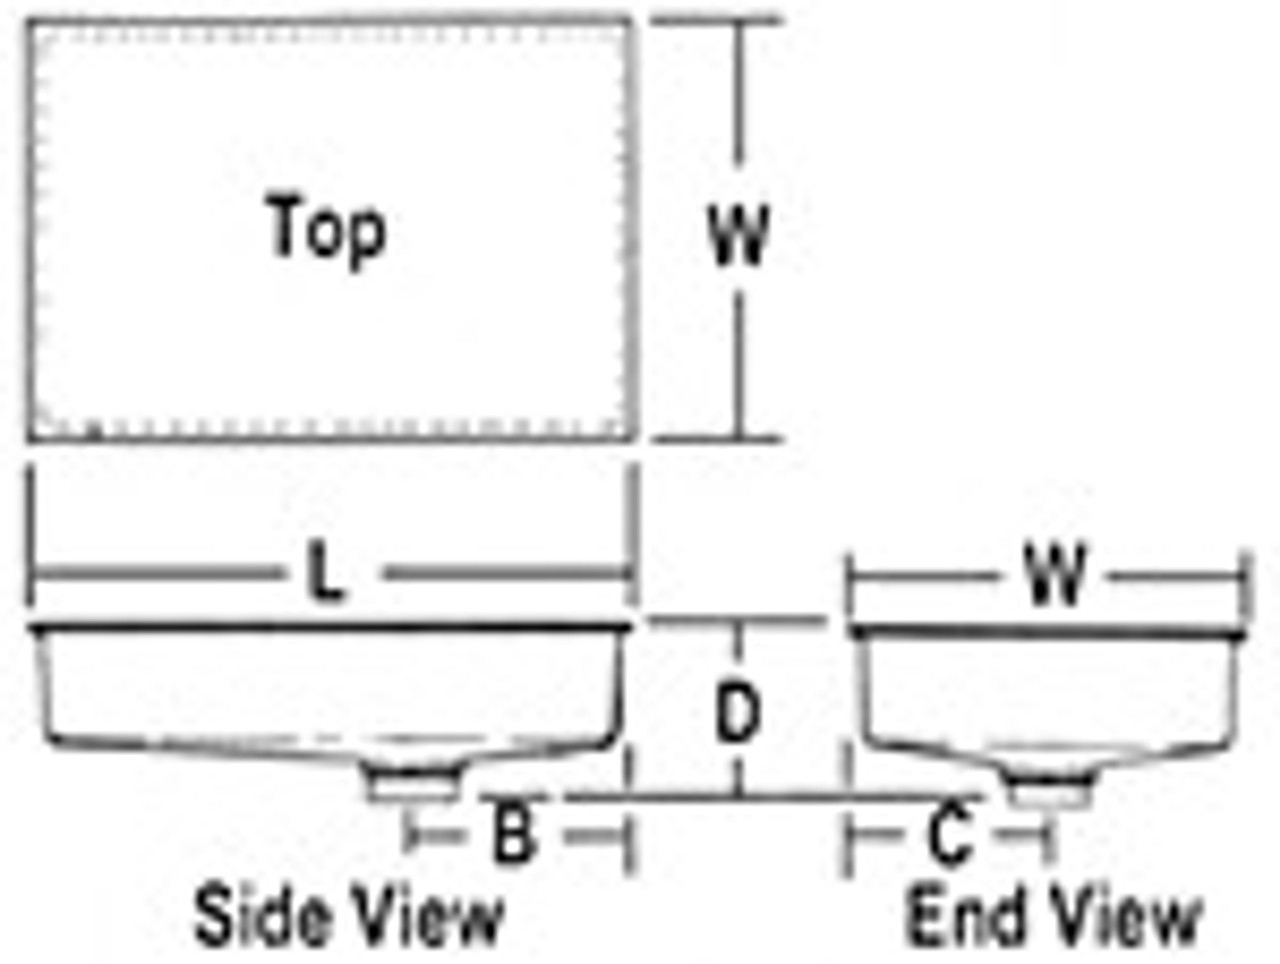 ABS HOLDING TANK BOTTOM DRAIN - 6 GALLON (11-1056)